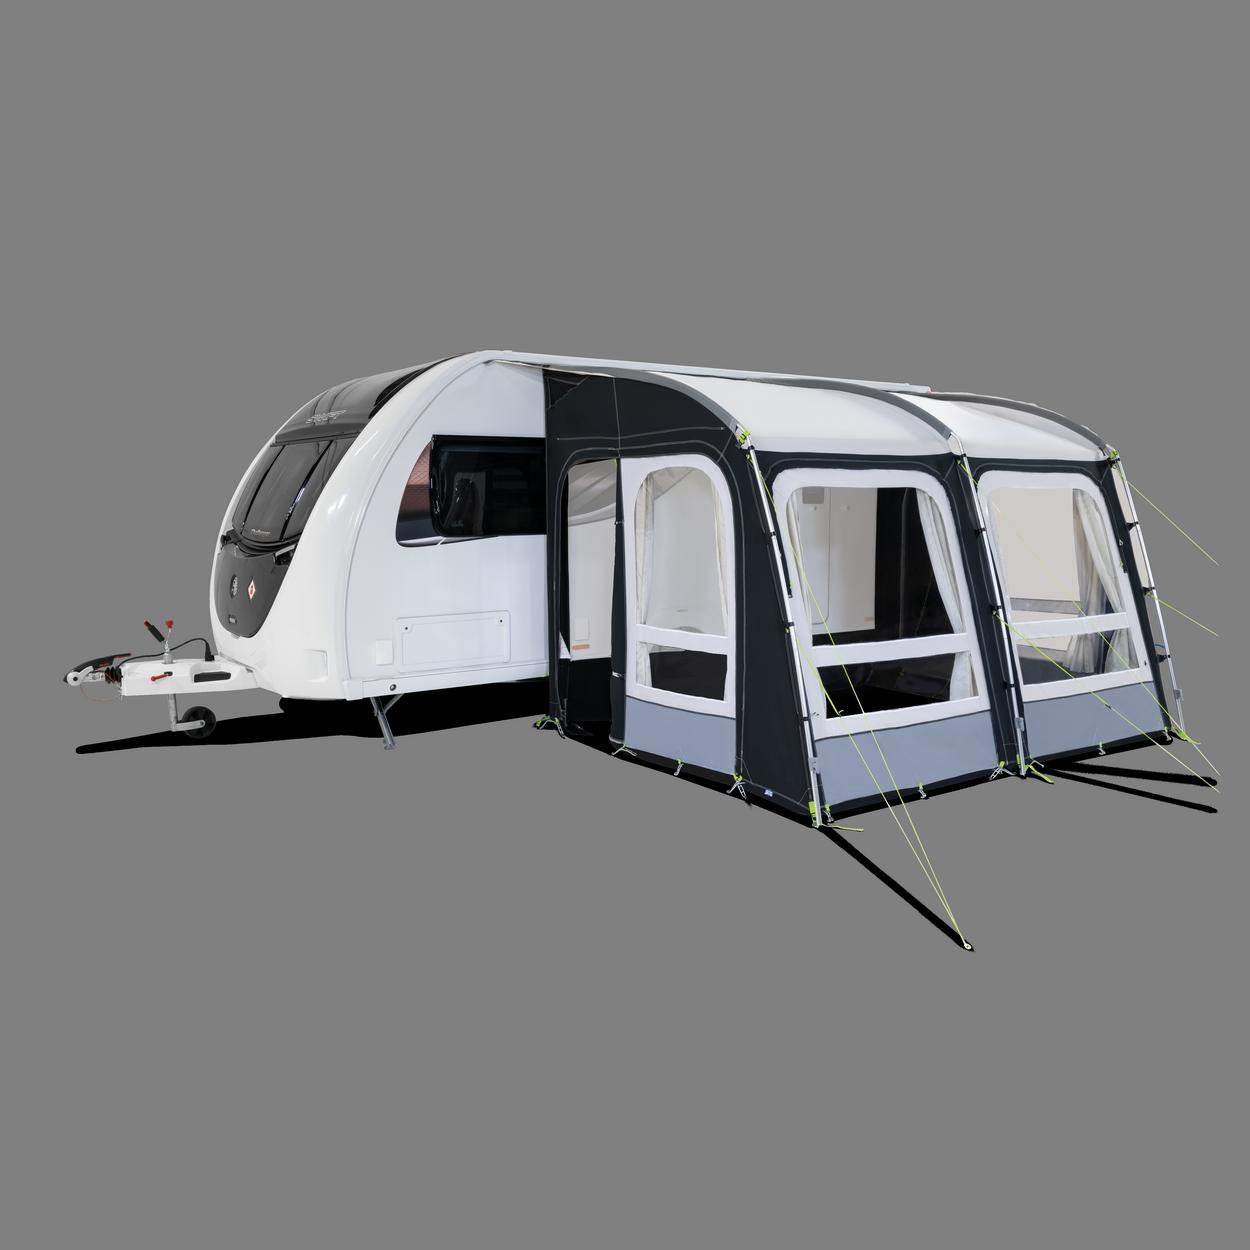 Kampa Dometic Rally Pro 330 Norwich Camping Aw0007